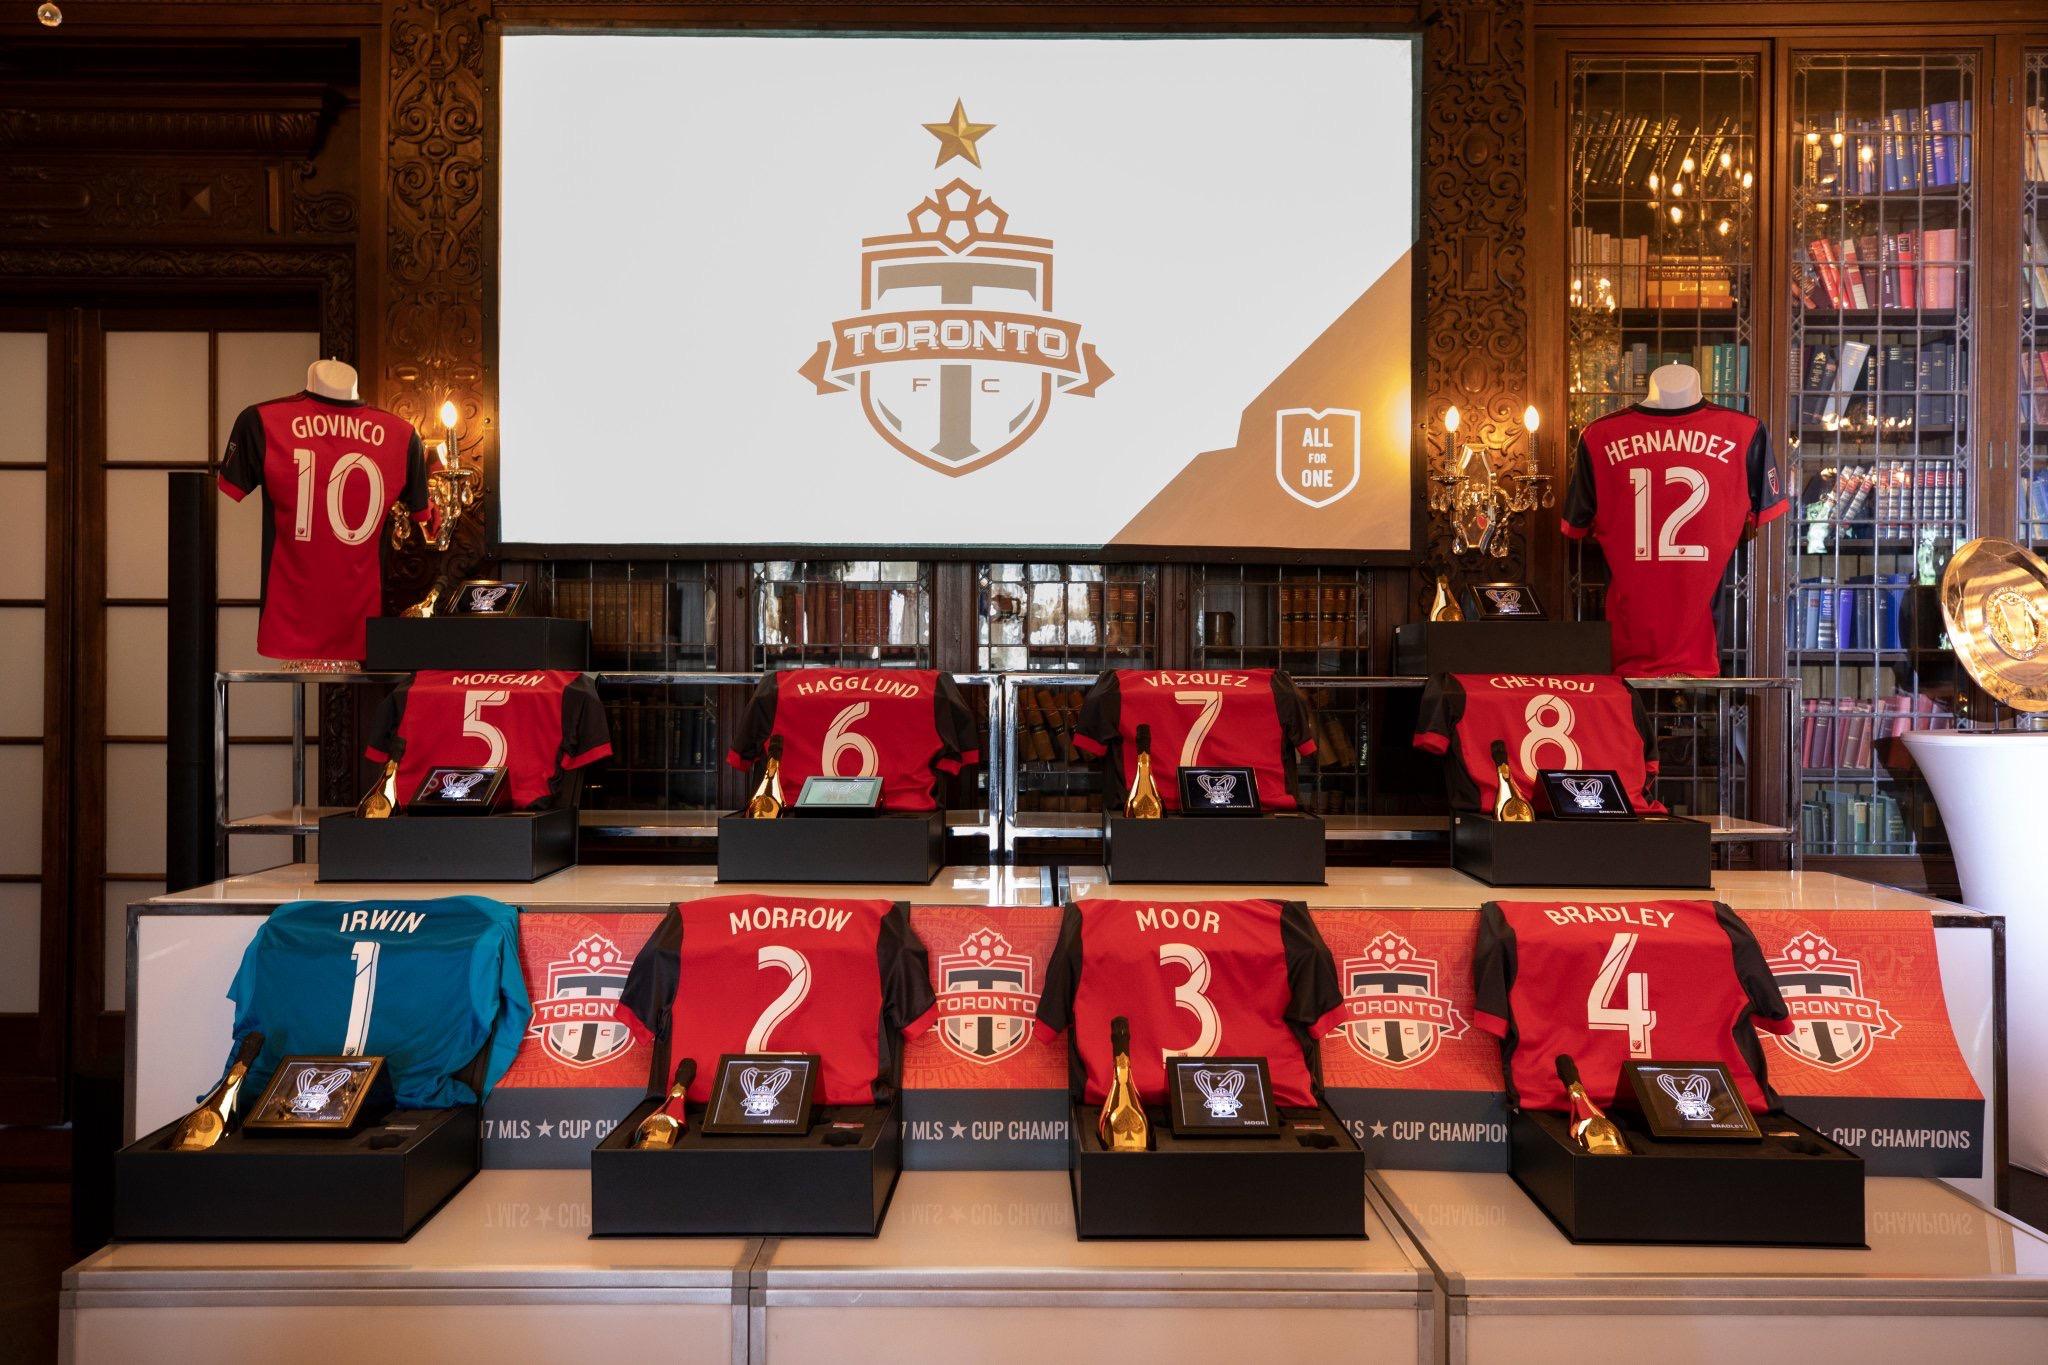 Toronto FC Championship Ring Presentation with Champagne Armand de Brignac - Armand de Brignac Champagne